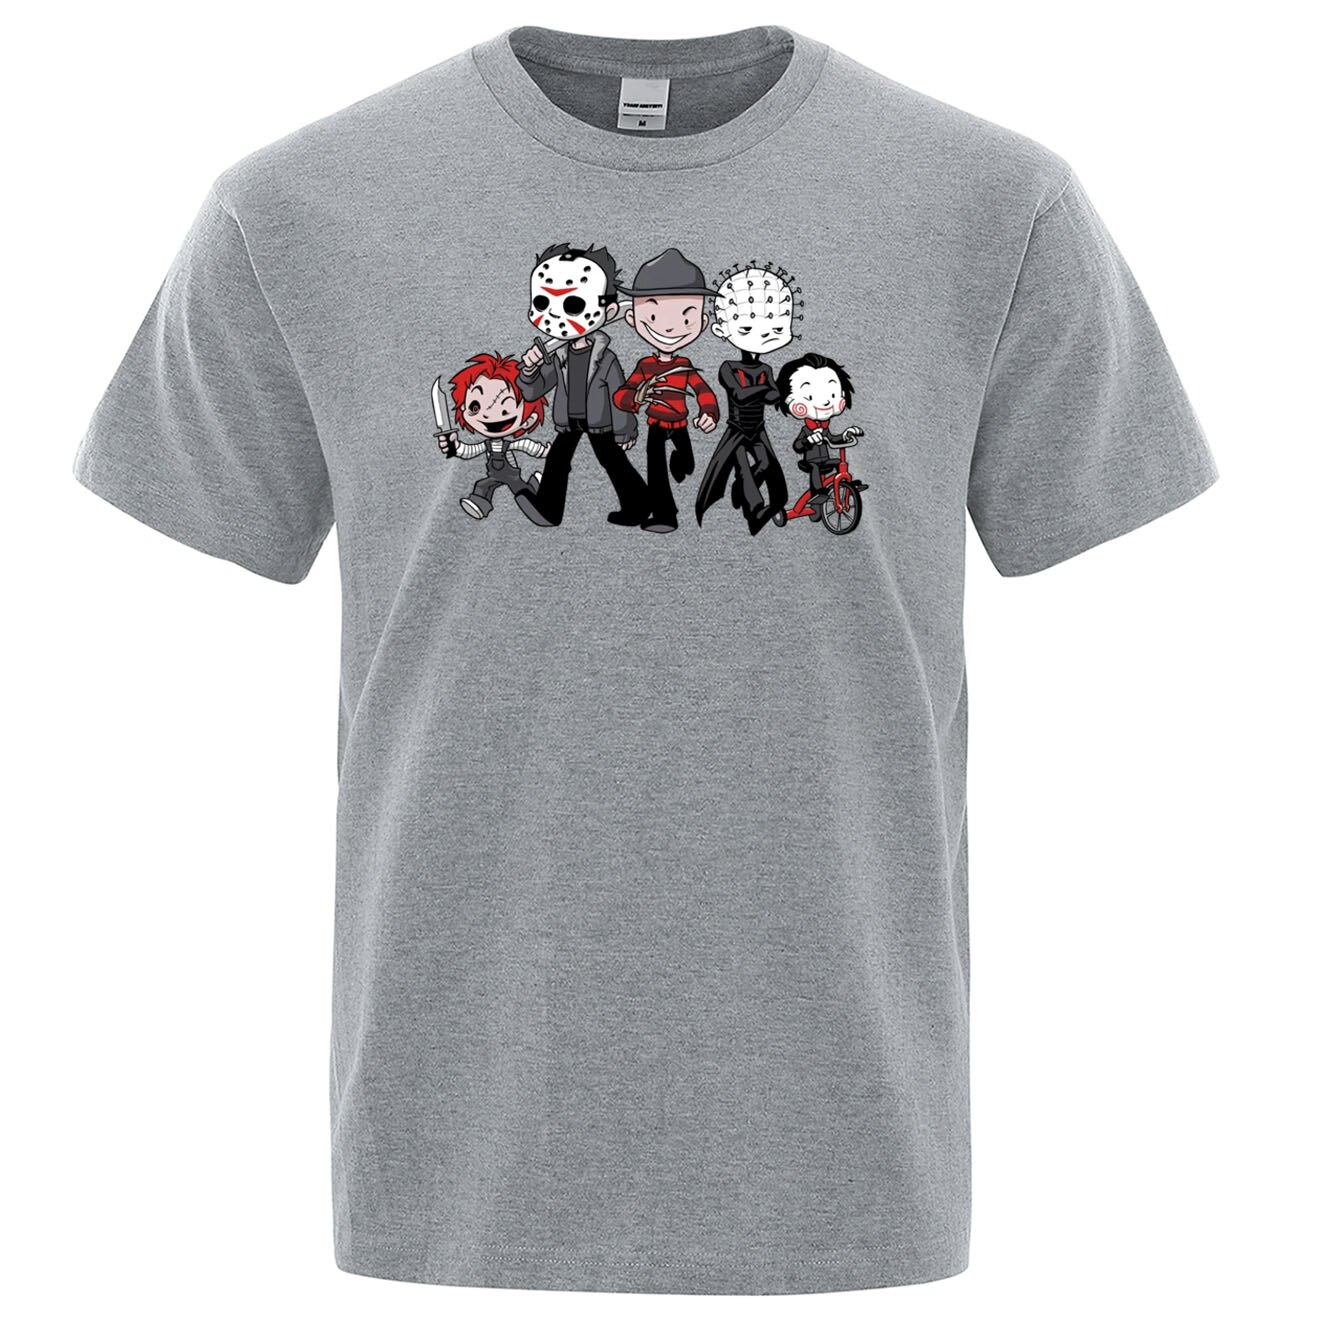 Zomer Katoen Korte Mouw T Shirt Maniac Park Horror Film Thema Park Jason Clown Saw Halloween Grappig Artsy mannen Tops Tees